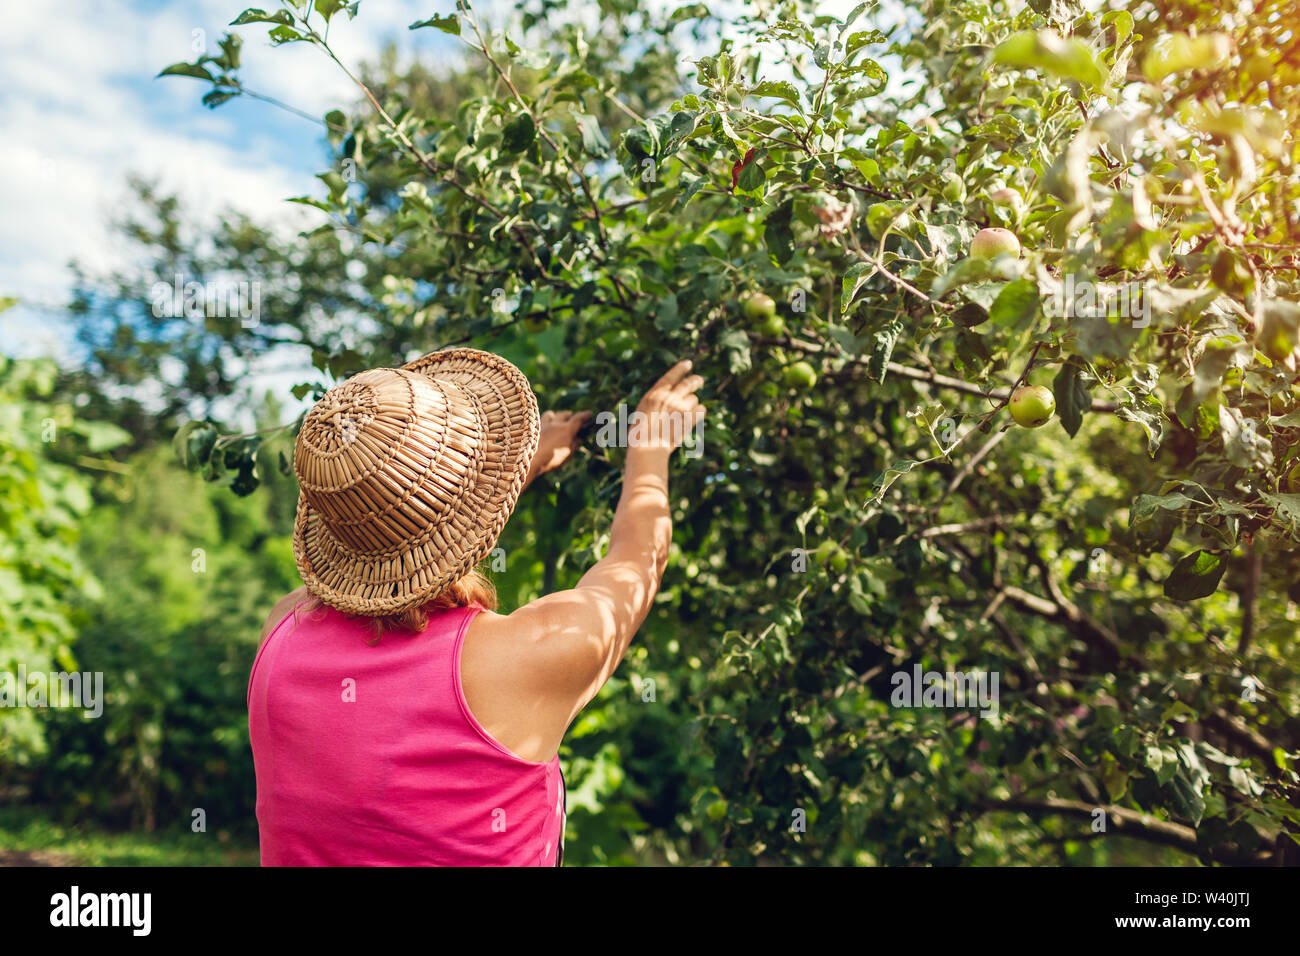 Senior woman checking unripe organic apples in summer orchard. Farmer taking care of fruit trees in garden - Stock Image